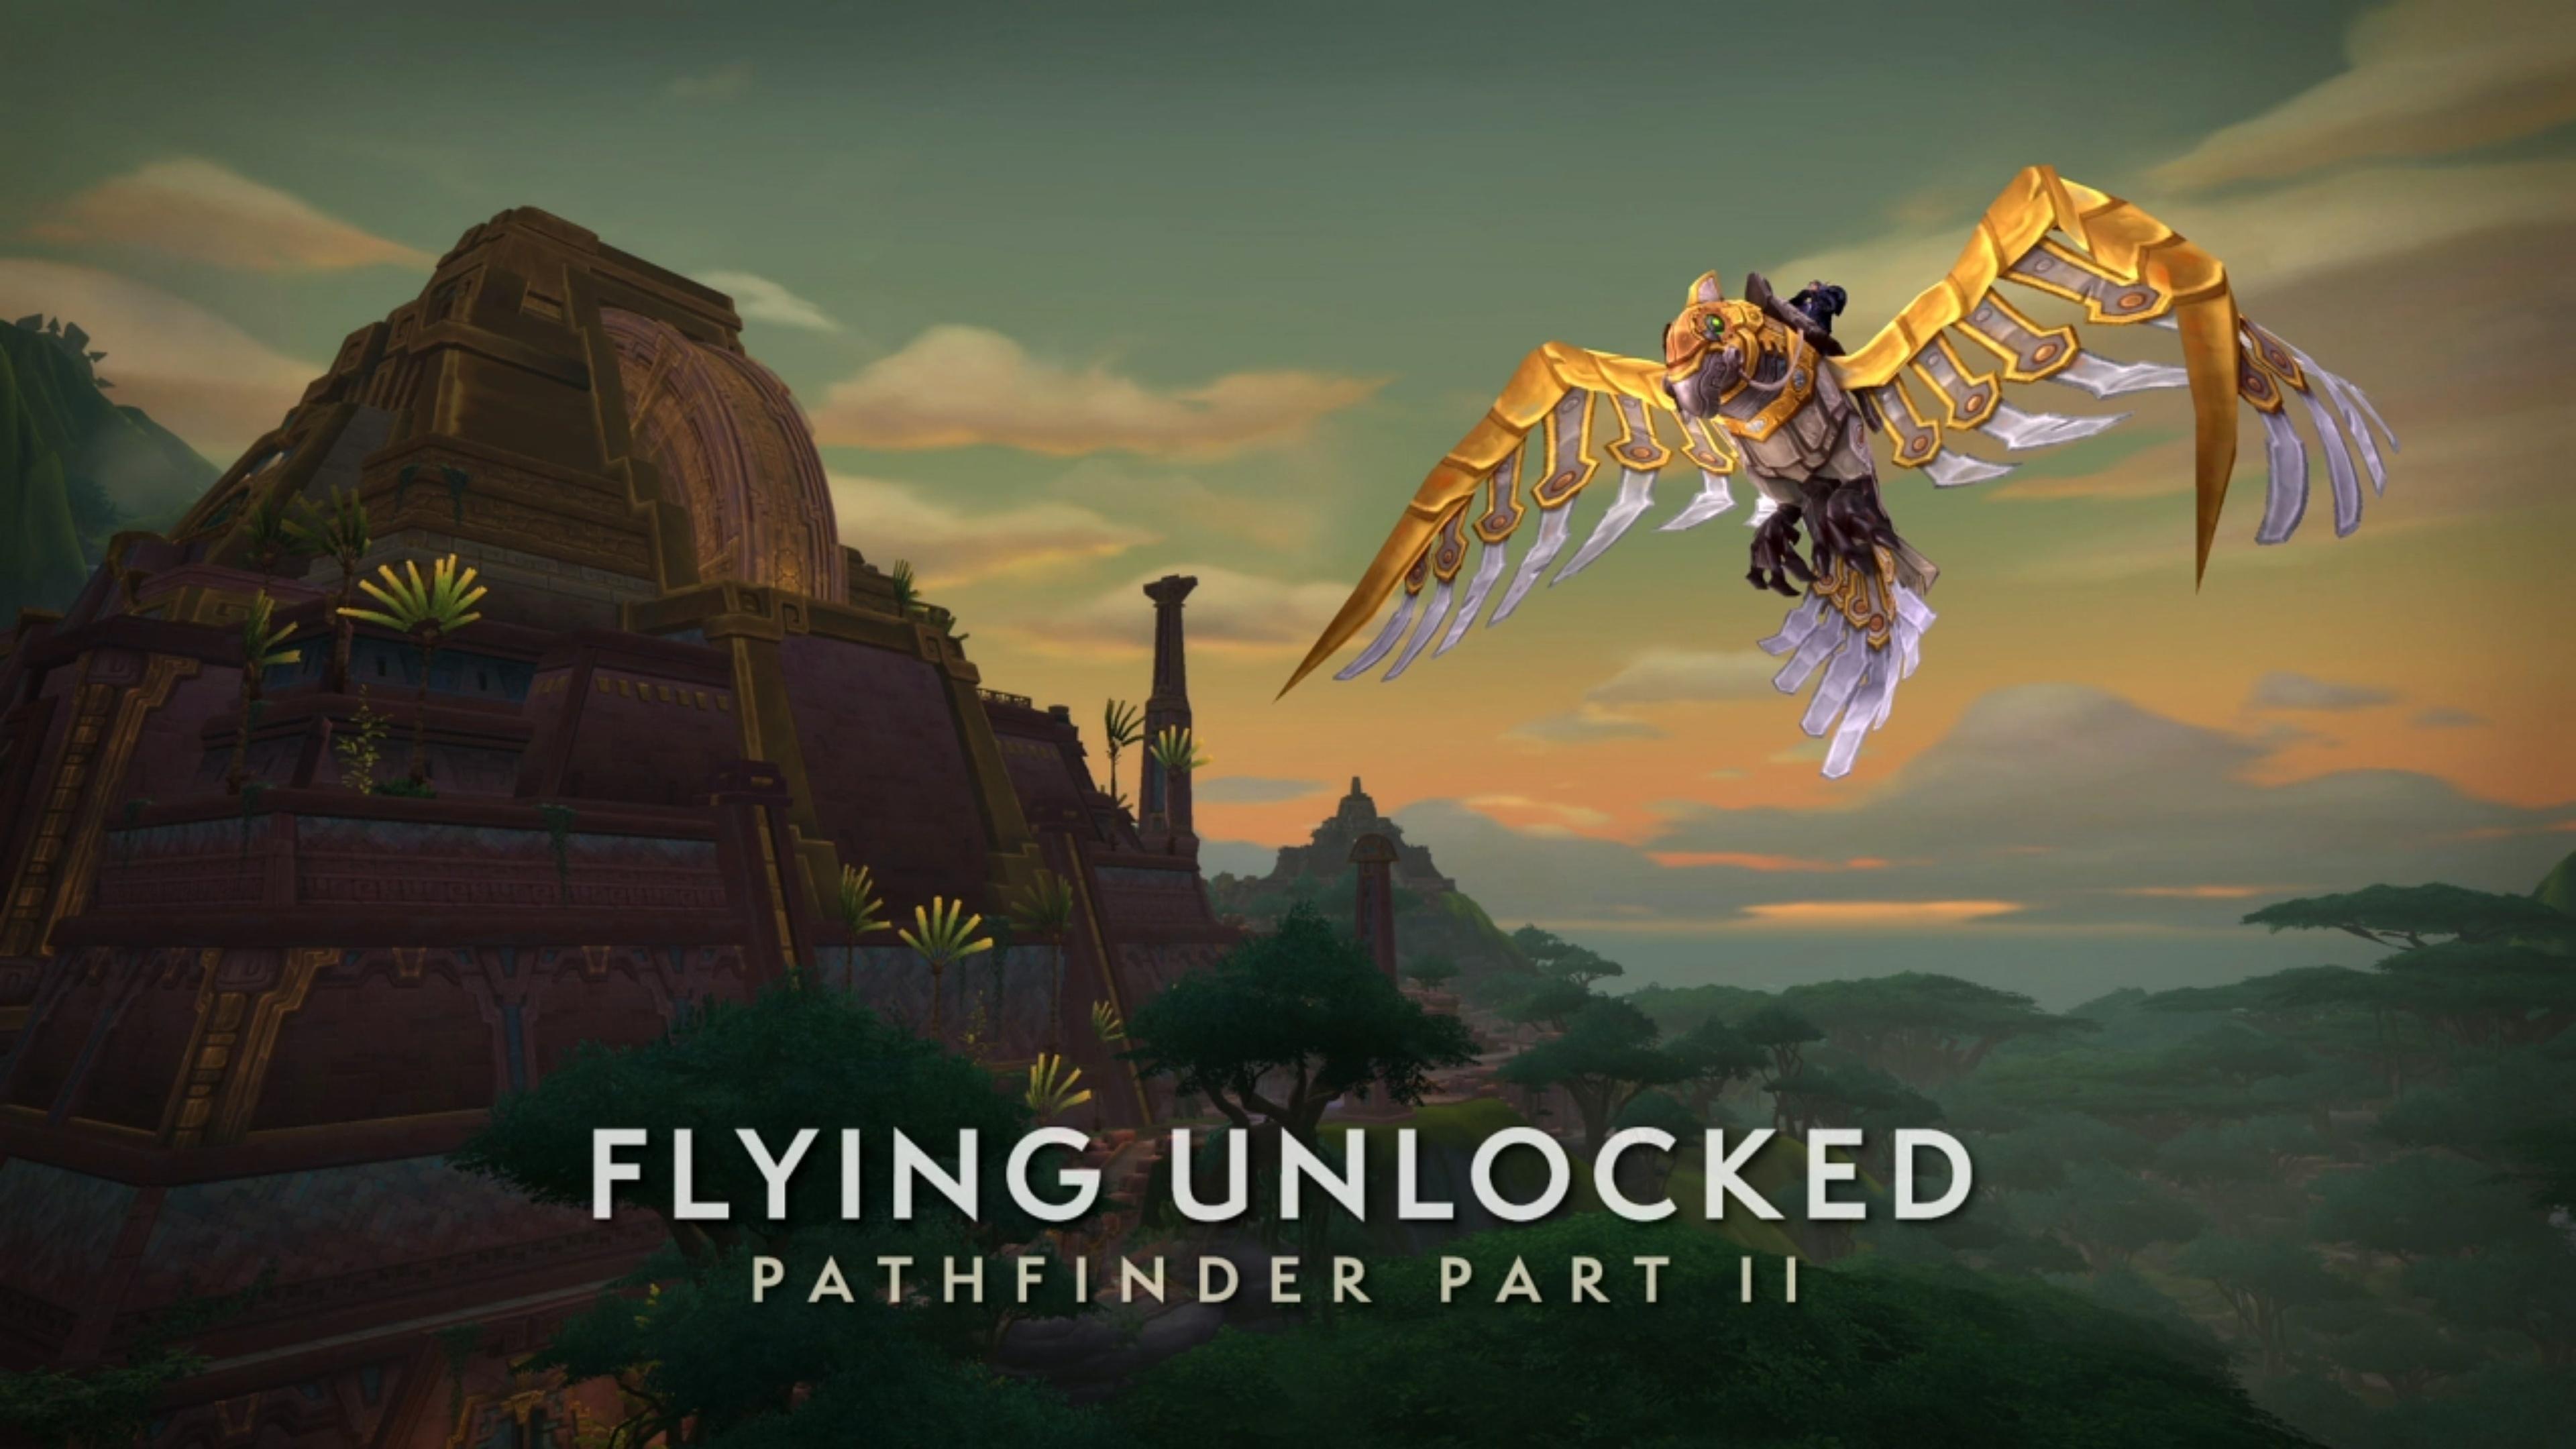 Battle for Azeroth Pathfinder Part 2: Flying Unlock